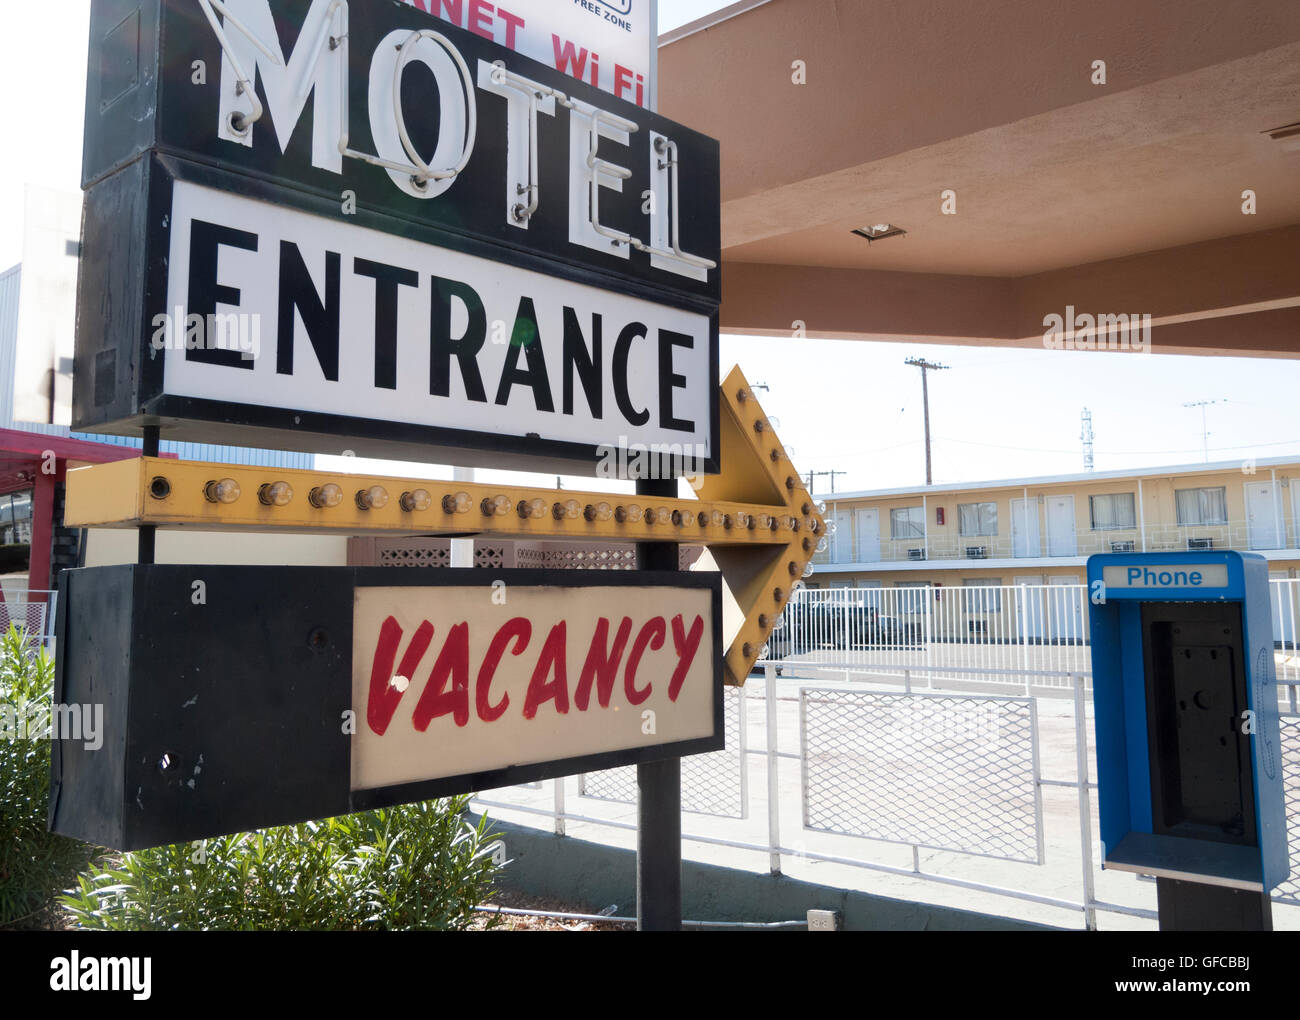 Motel Sign, Las Vegas, Nevada, USA 2010-02-17 1:49:16 PM - Stock Image